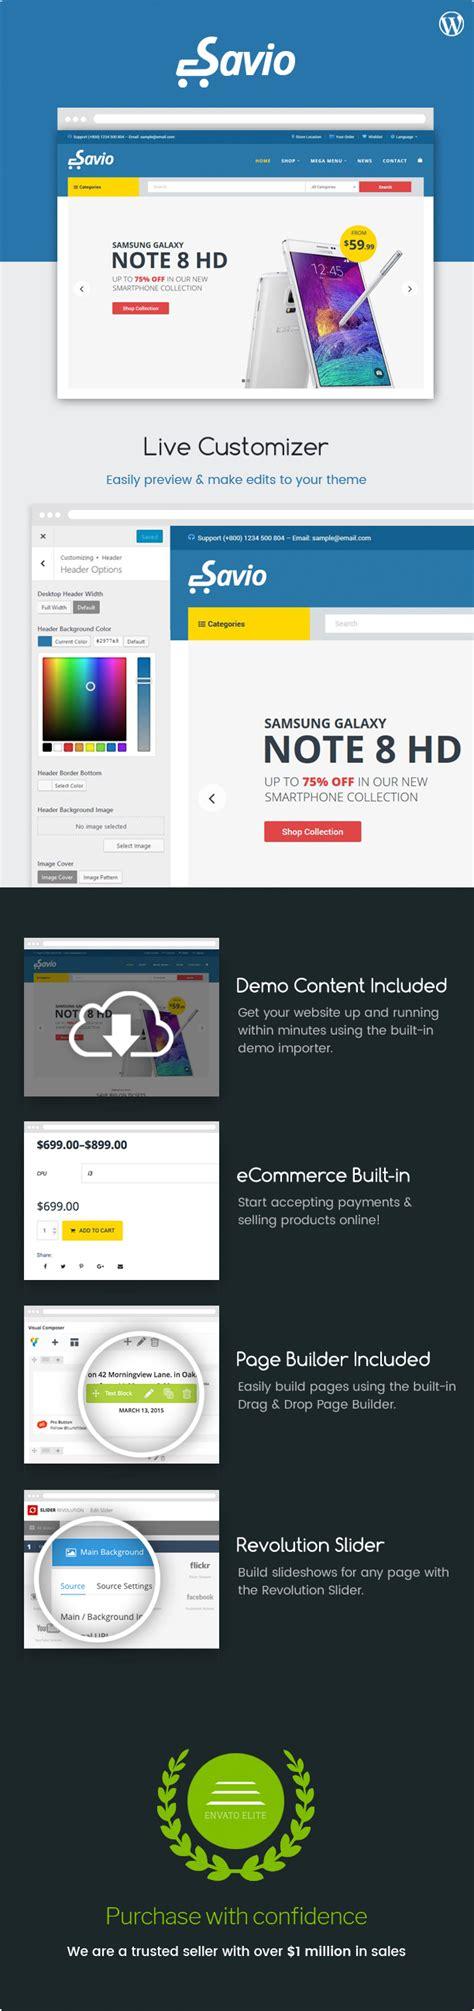 themes store ecommerce savio ecommerce store theme webdesign seo